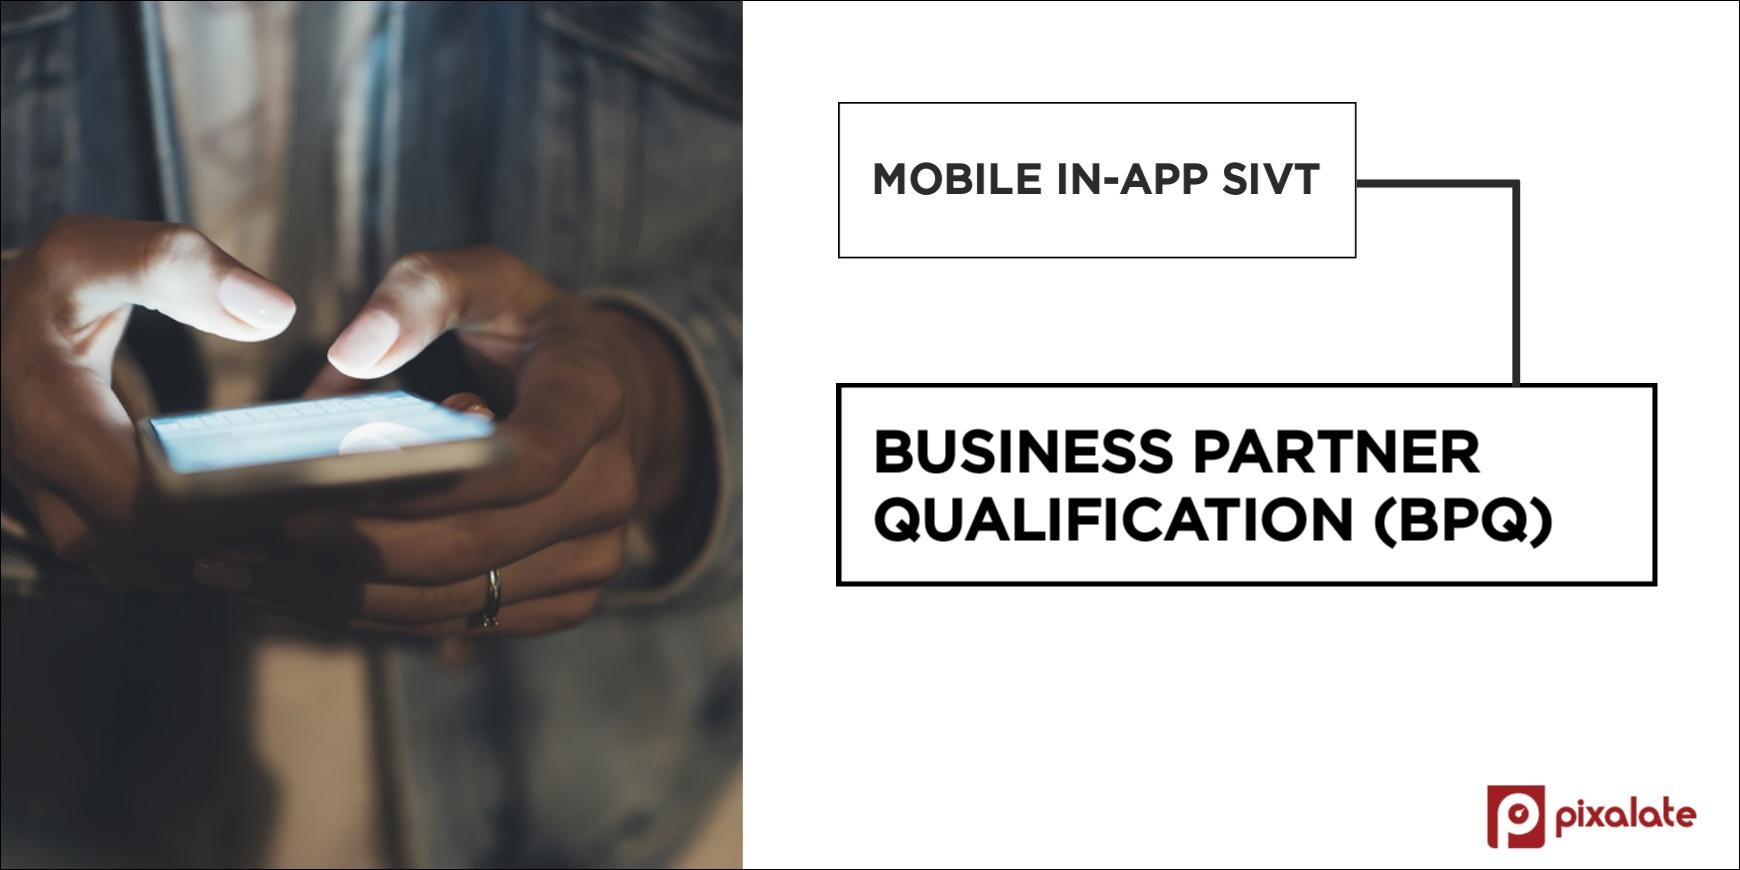 mrc-mobile-app-invalid-traffic-ivt-sivt-business-partner-qualification-1